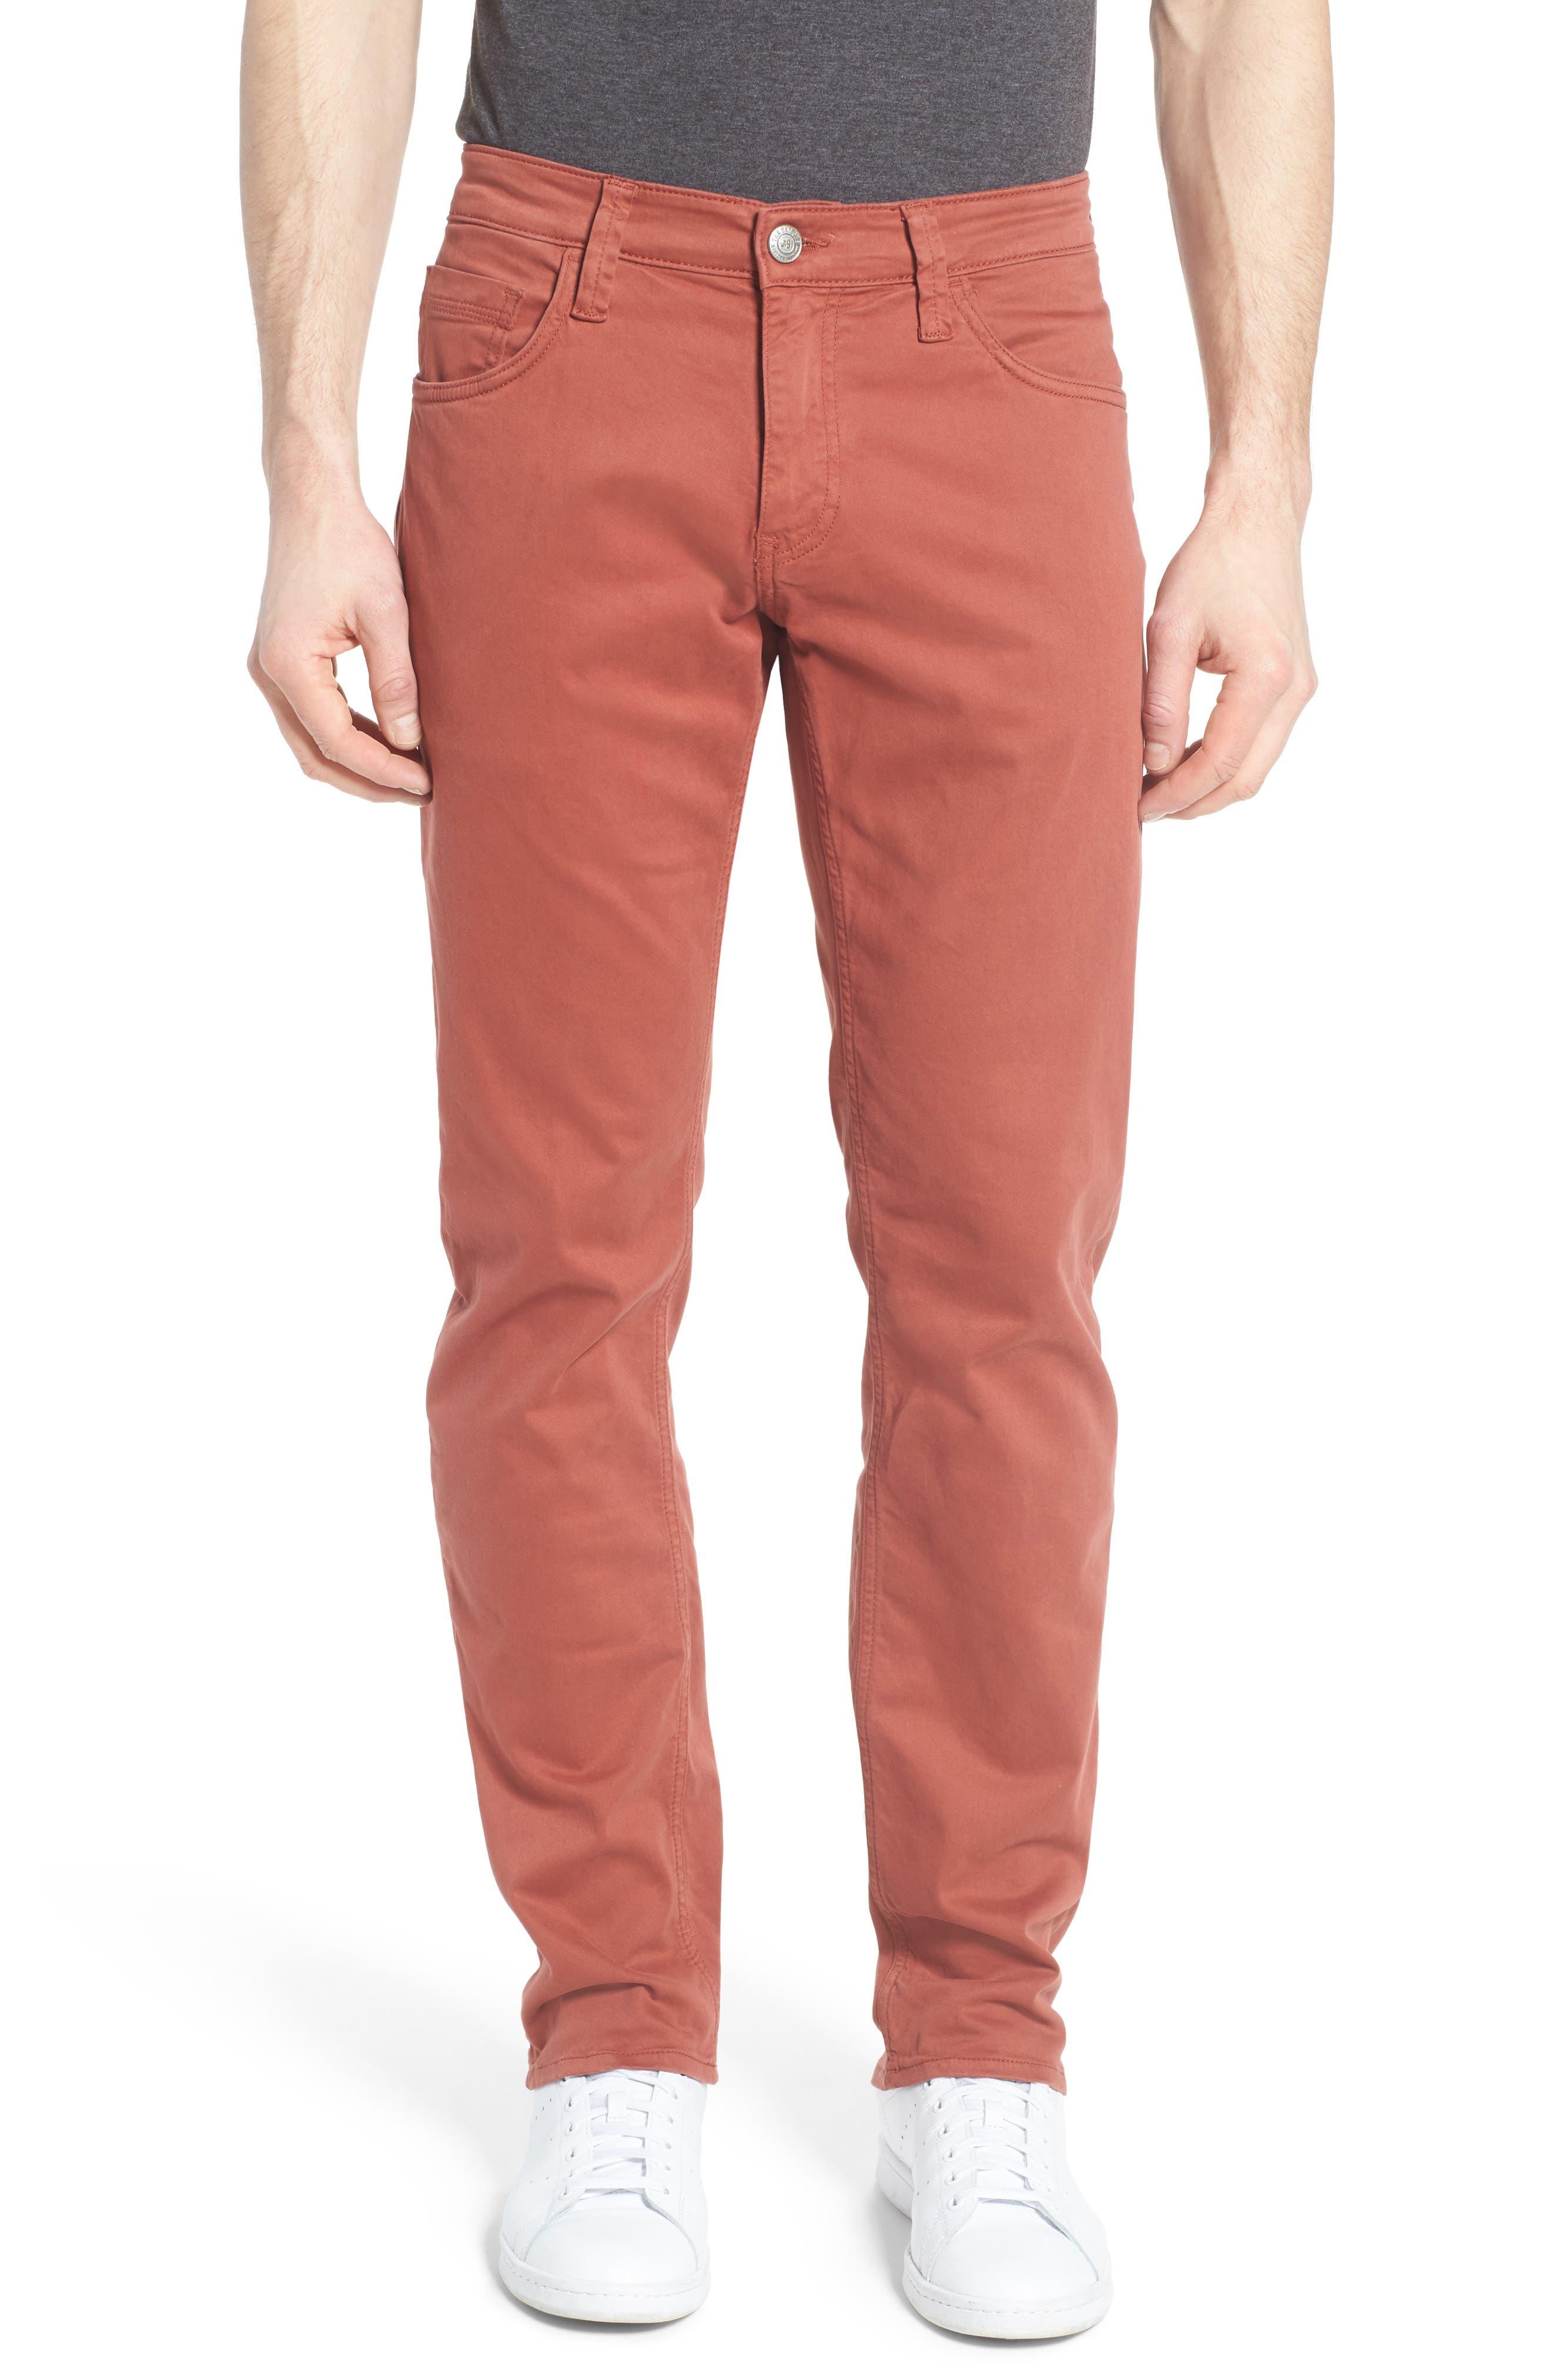 Zach Straight Leg Jeans,                         Main,                         color, Brick Red Twill